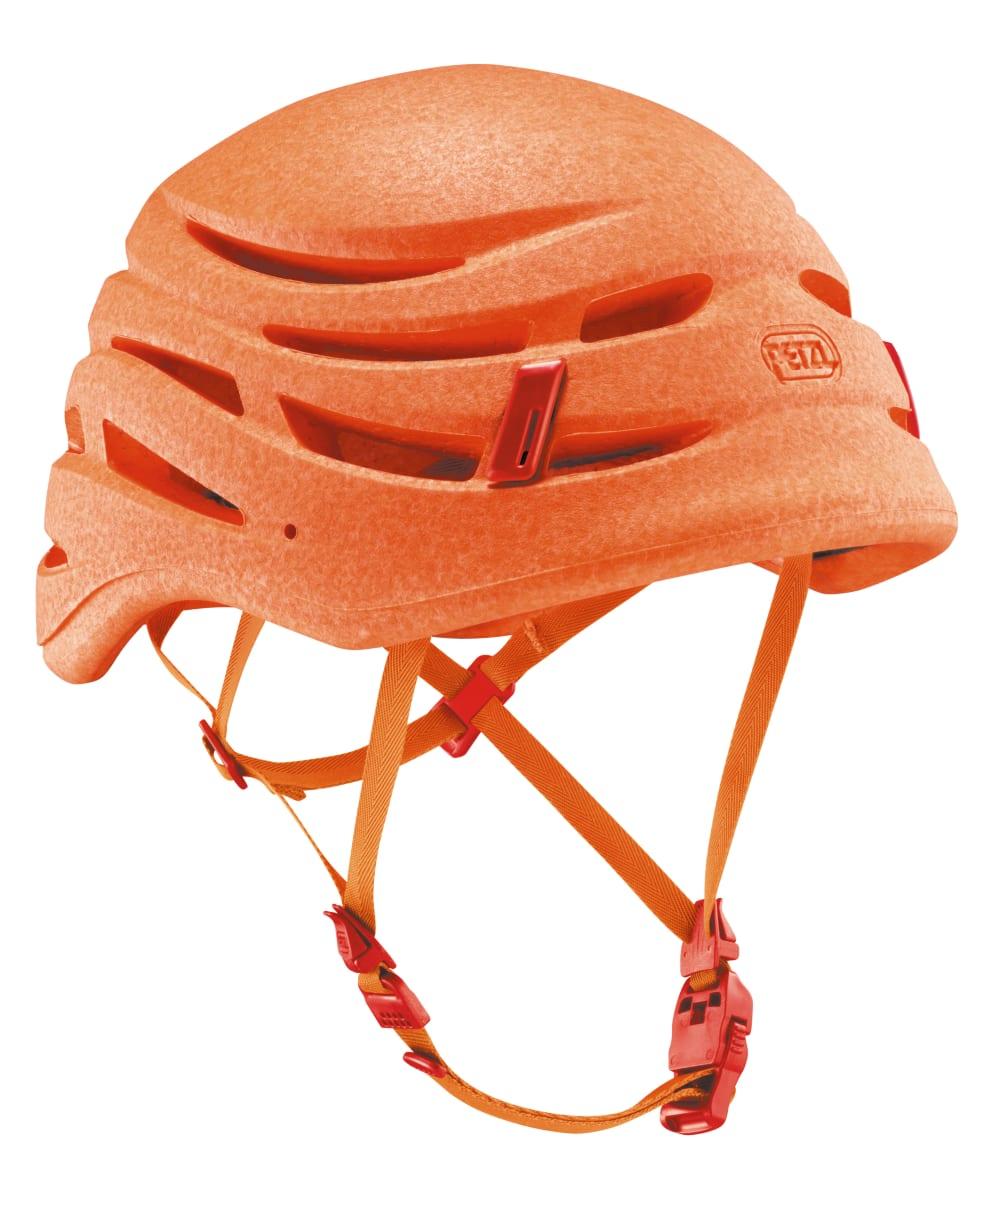 PETZL Sirocco Climbing Helmet 1